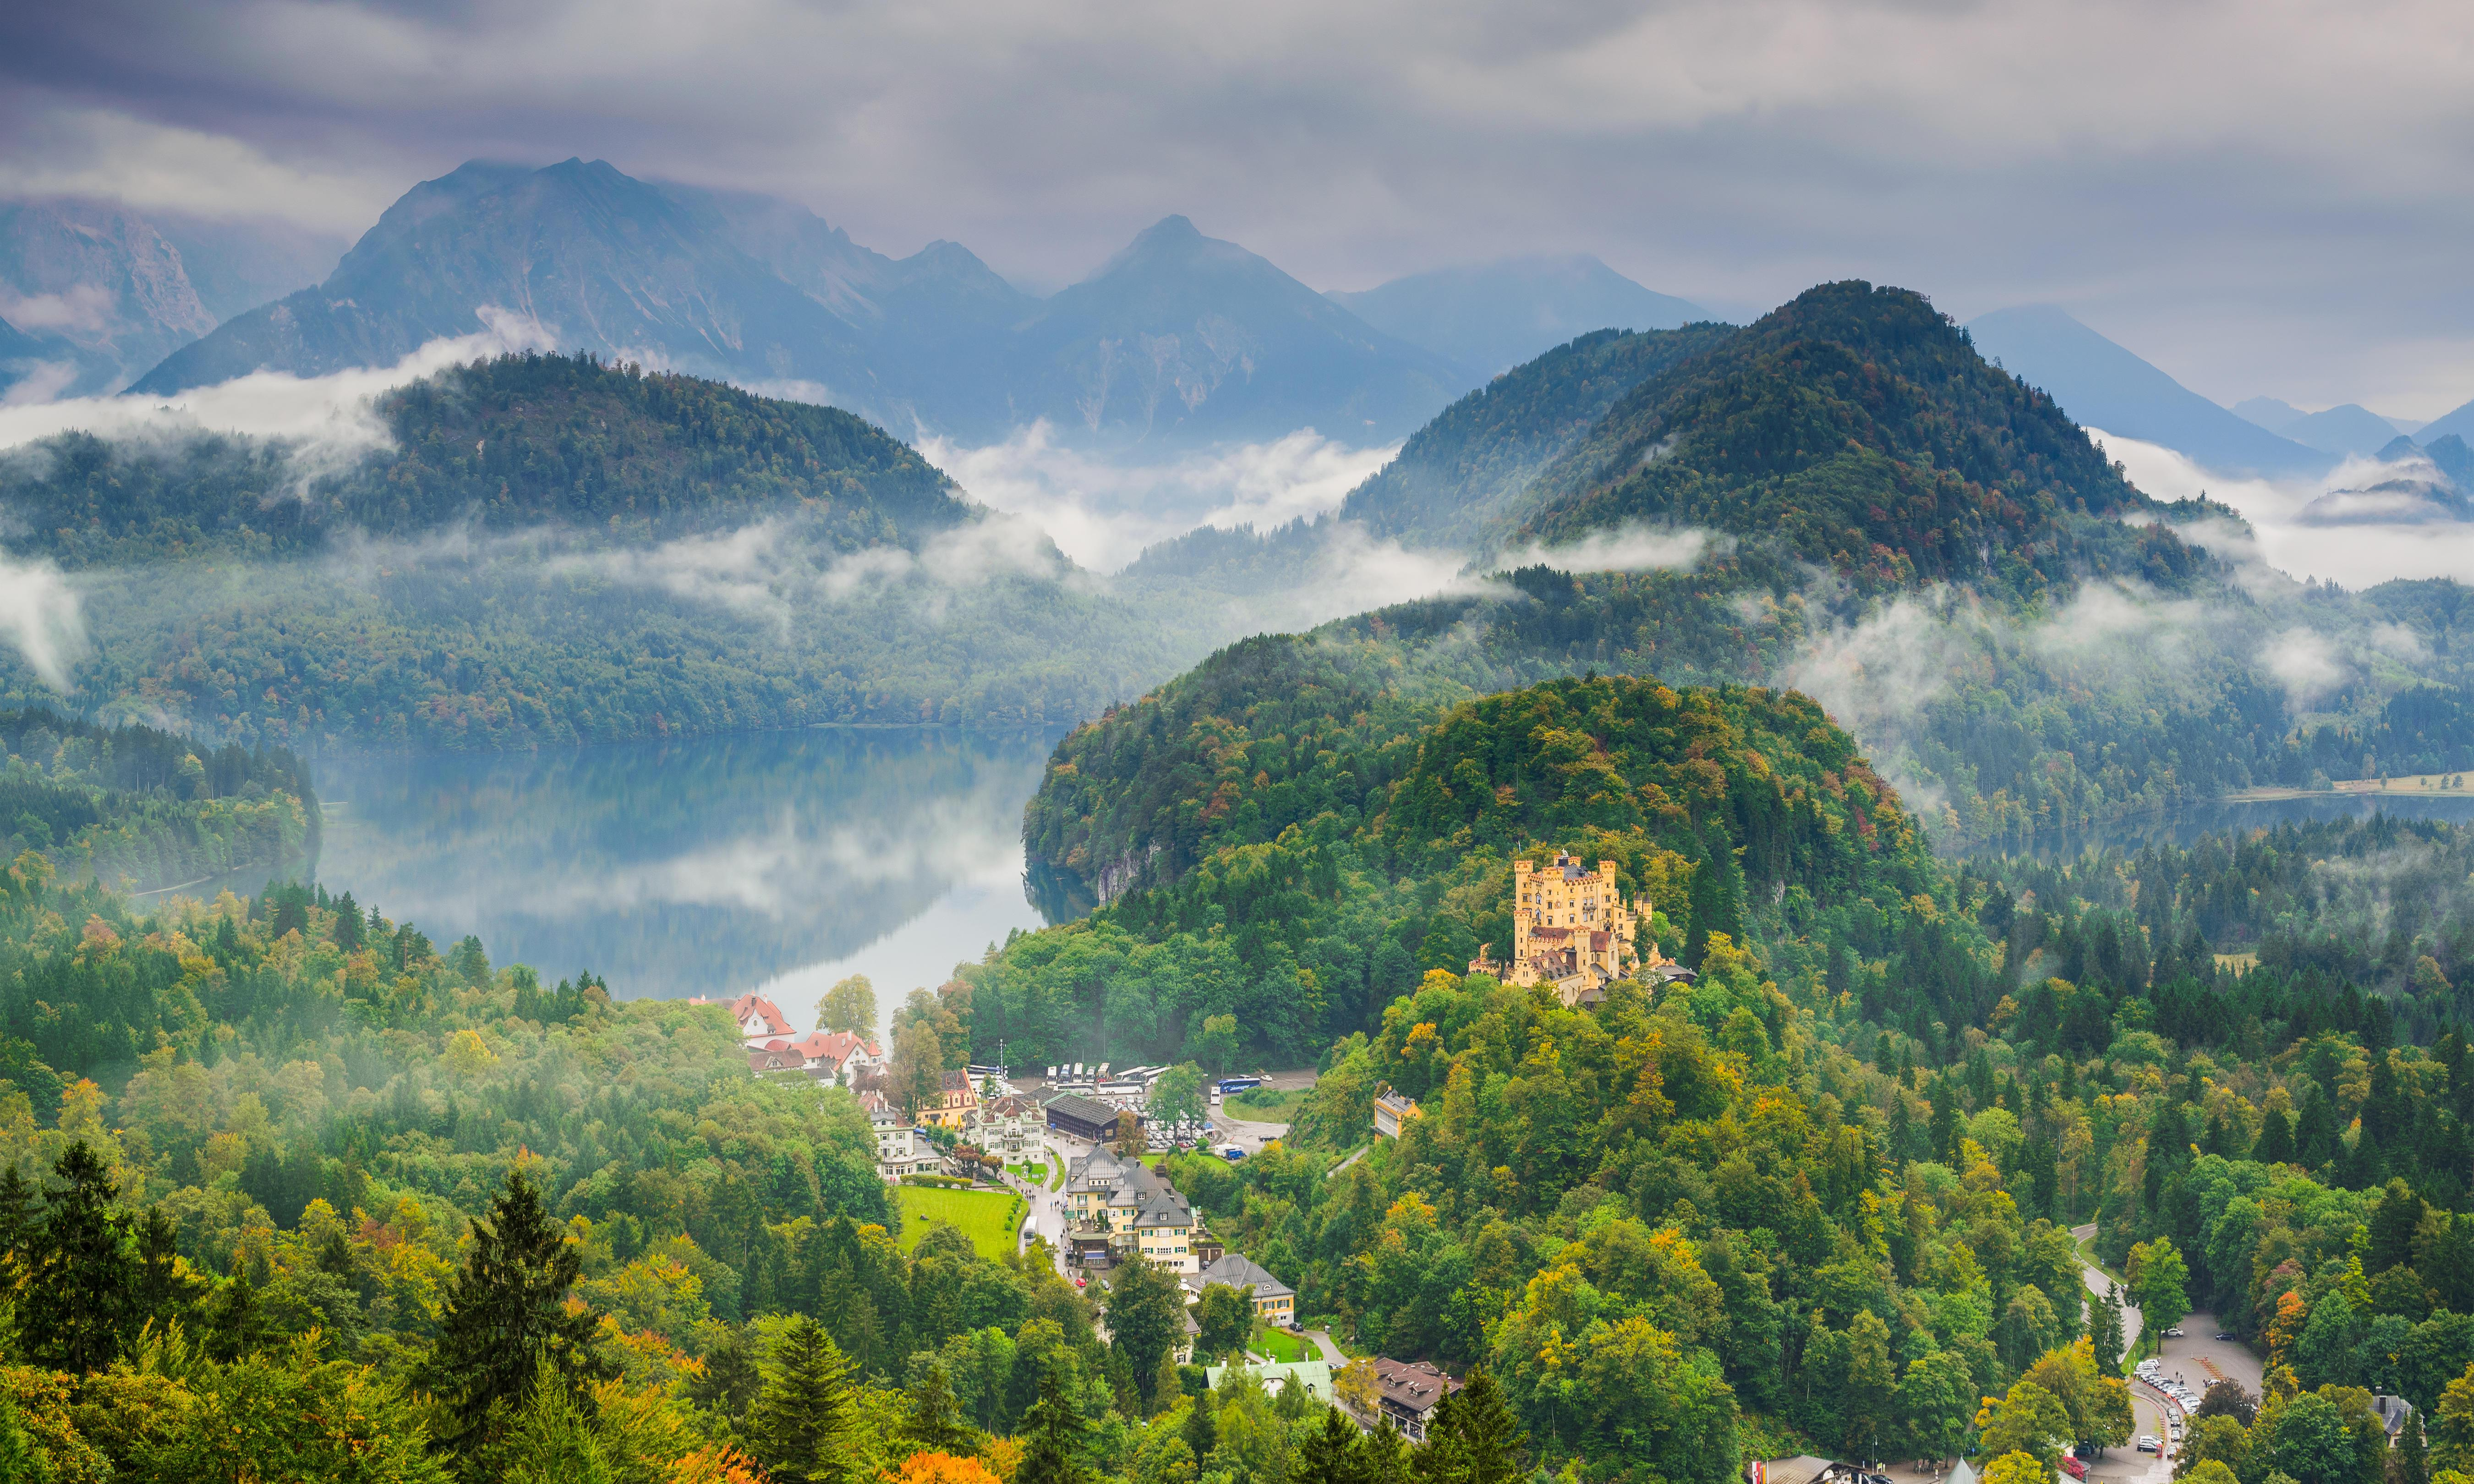 'Part of German soul' under threat as forests die